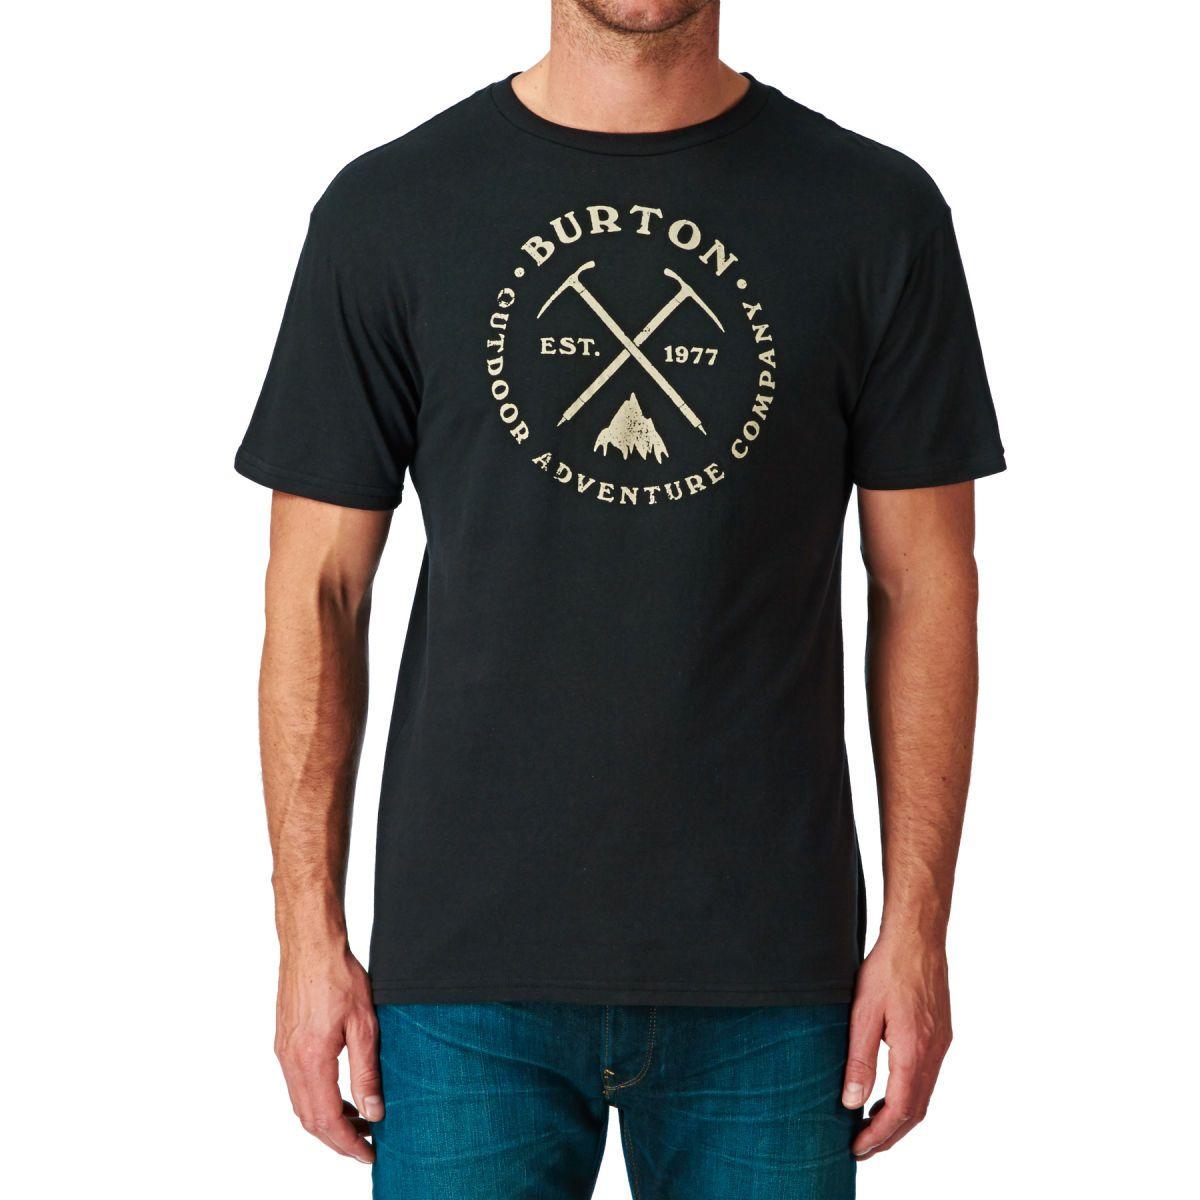 Size Of T Shirt Design Google Search: Burton Shirts - Google Search